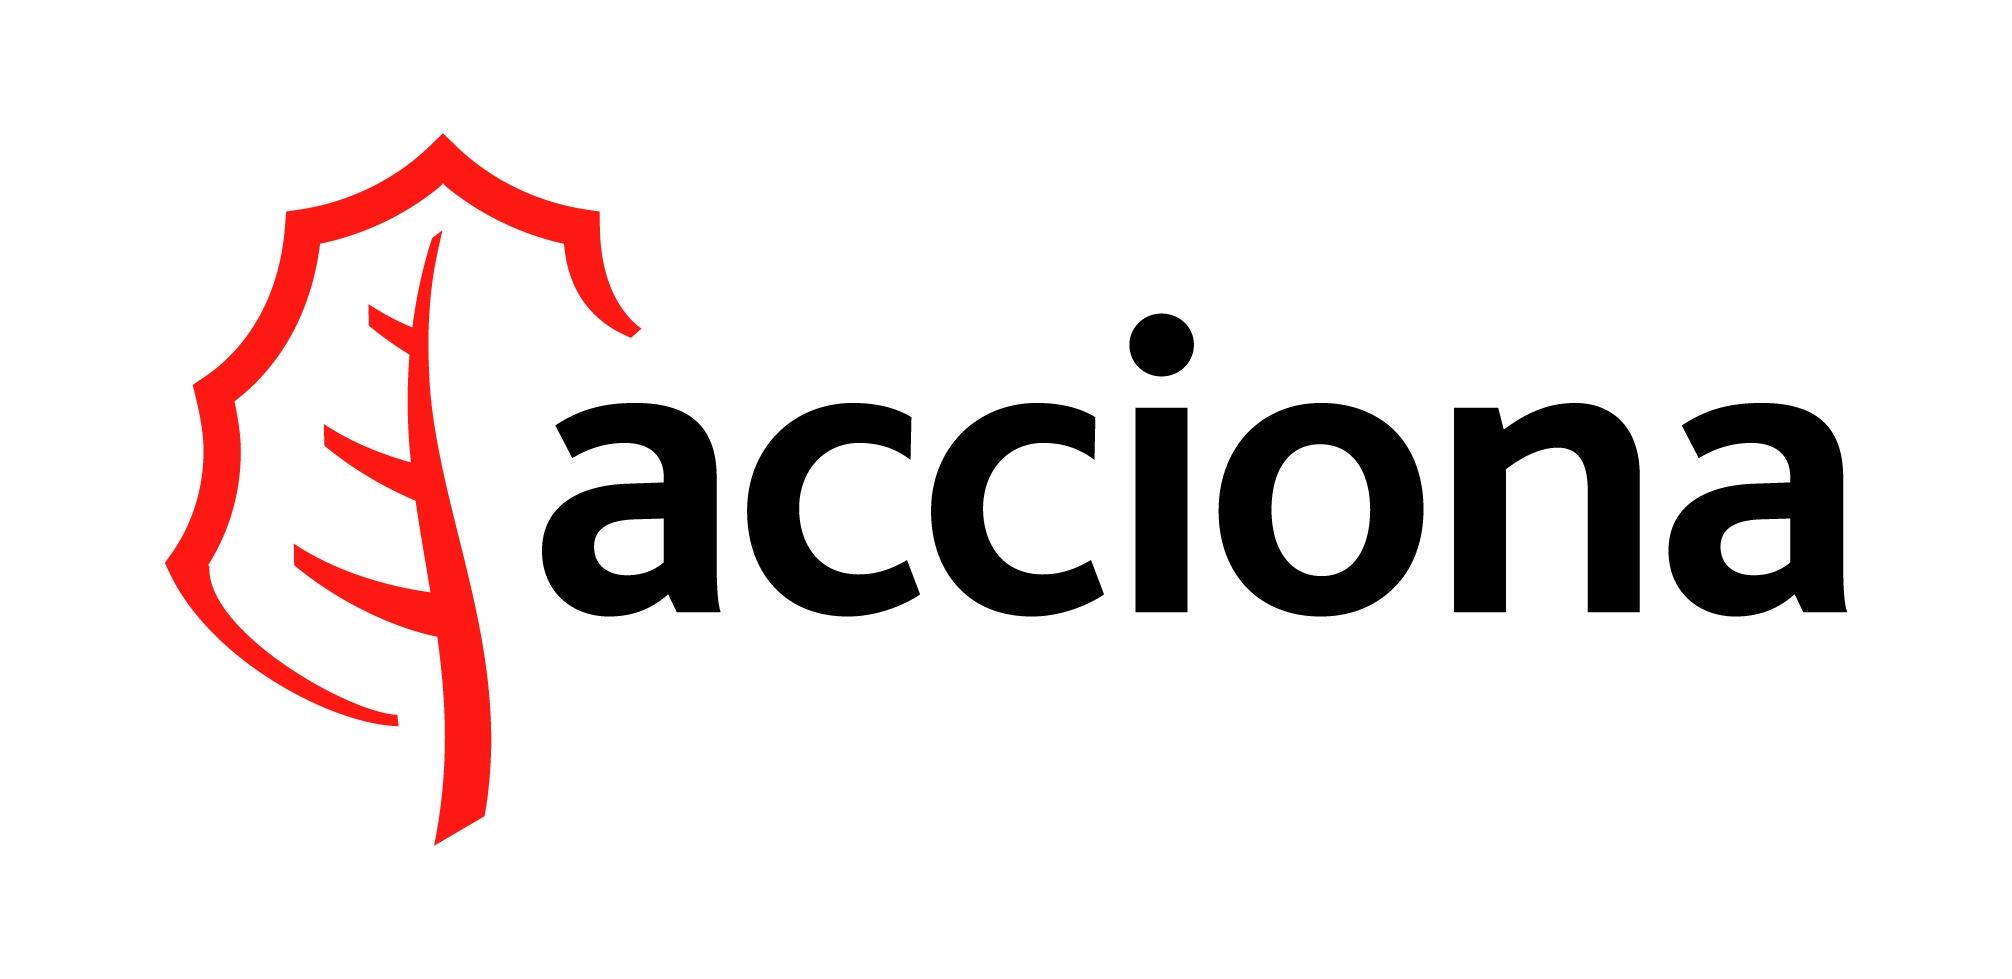 Primaxis Acciona case study logo